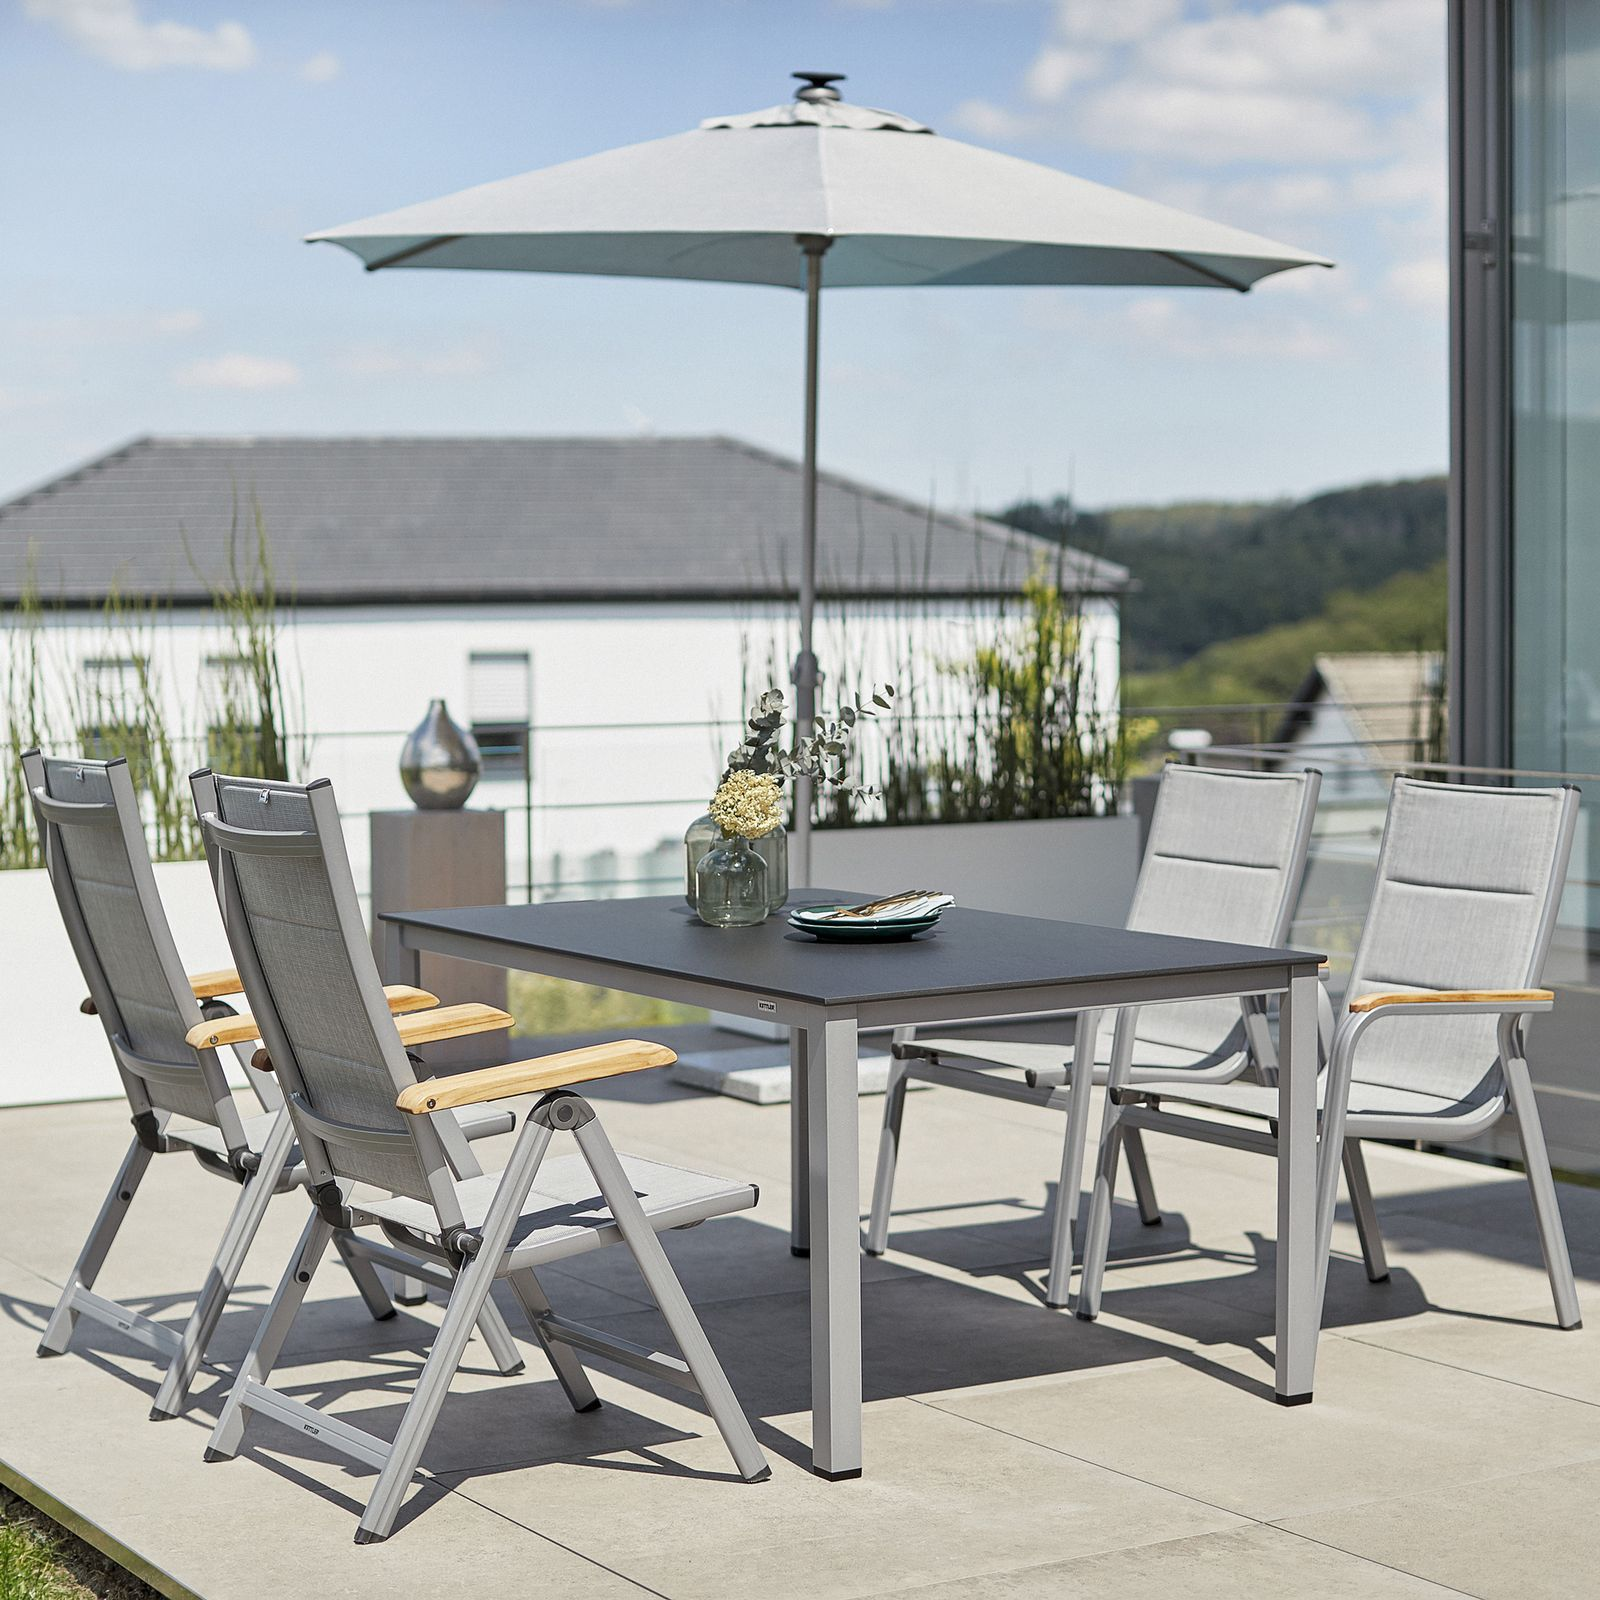 Záhradný stôl Cubic Silver / Antracit 160 x 95 cm KETTLER